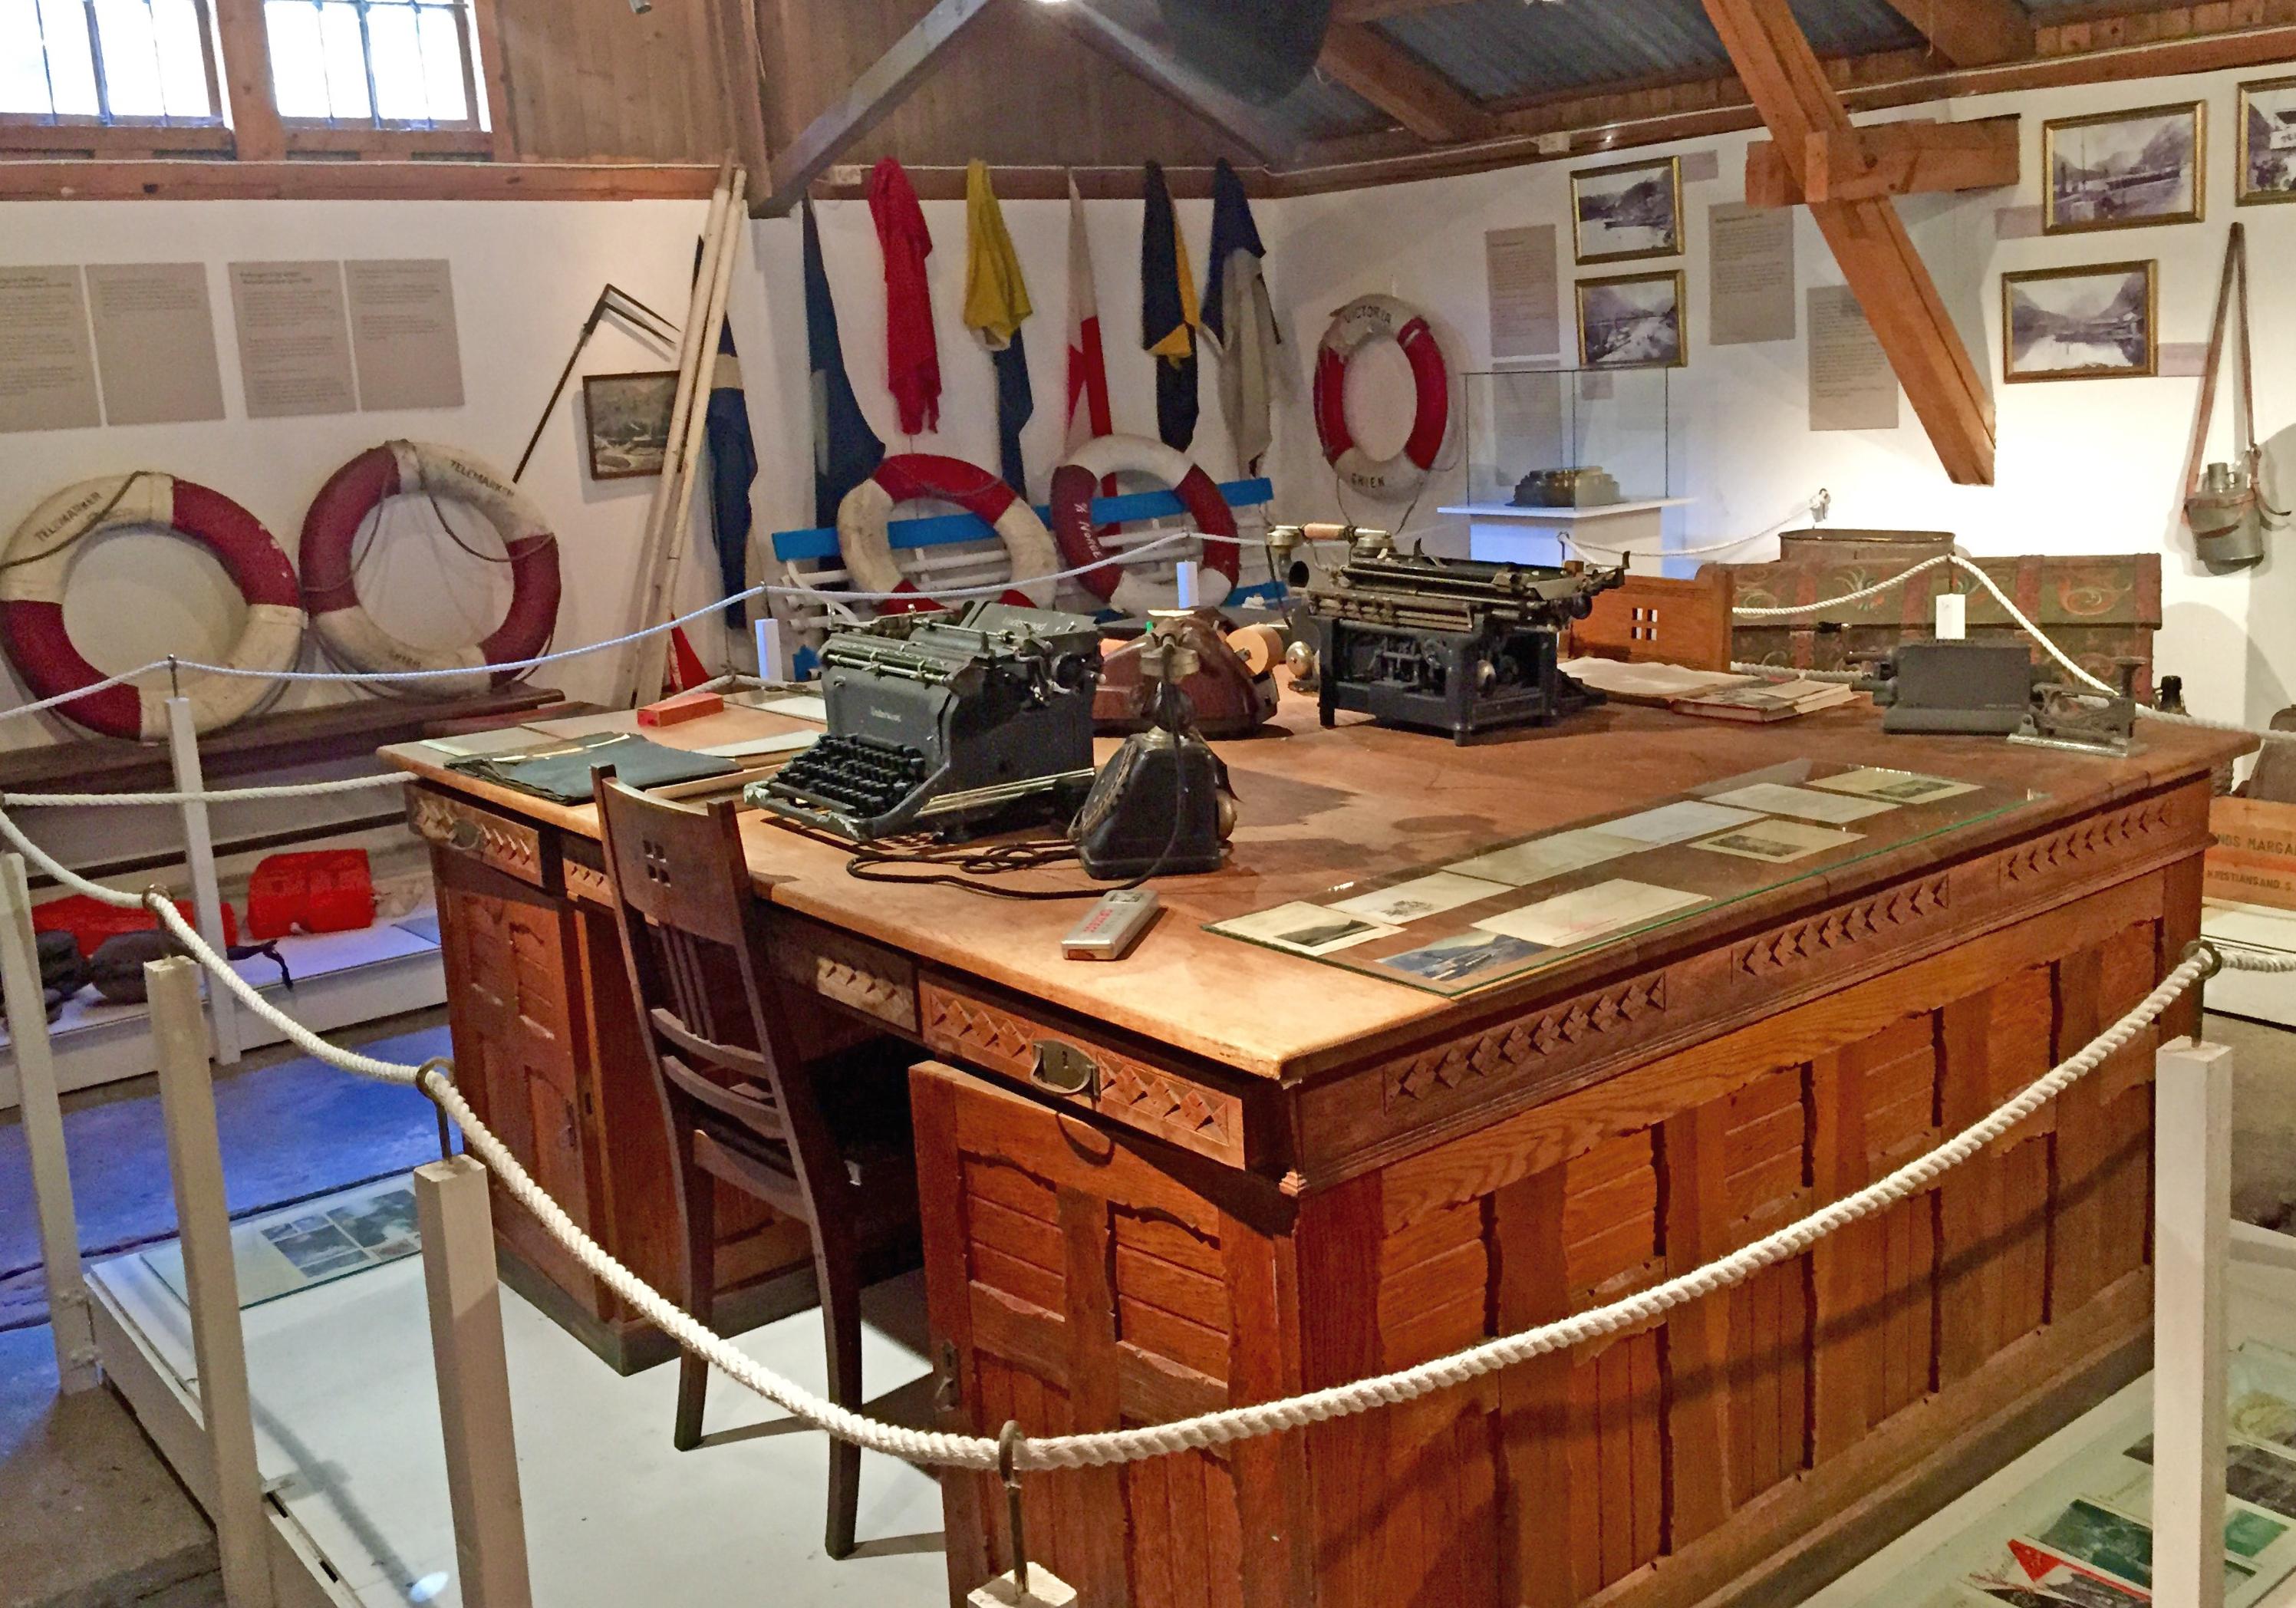 Bryggemuseet har permanent utstilling med Telemarkskanalens historie.